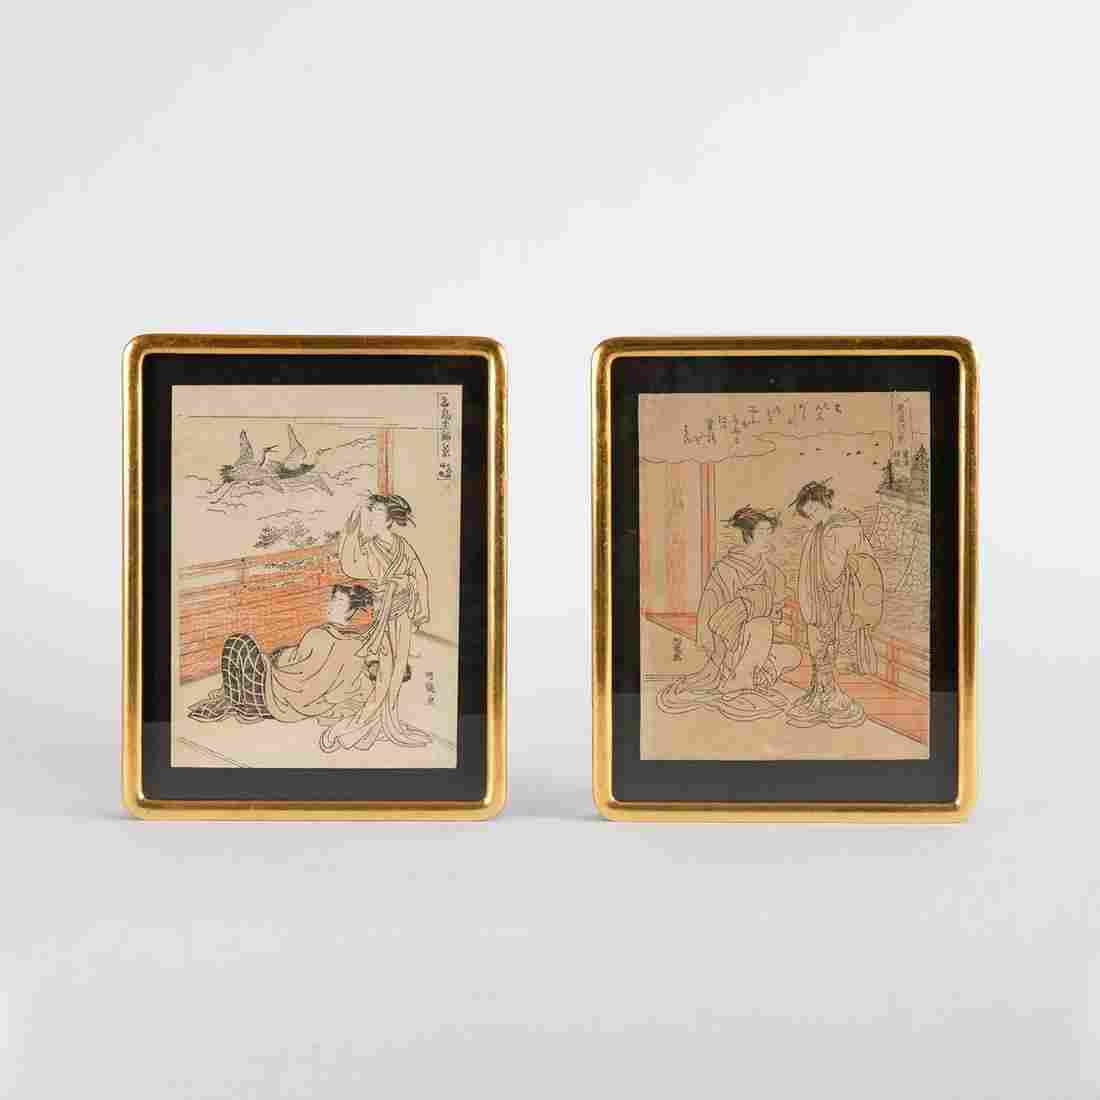 Two Isoda Koryusai Ukiyo-e Color Woodblocks